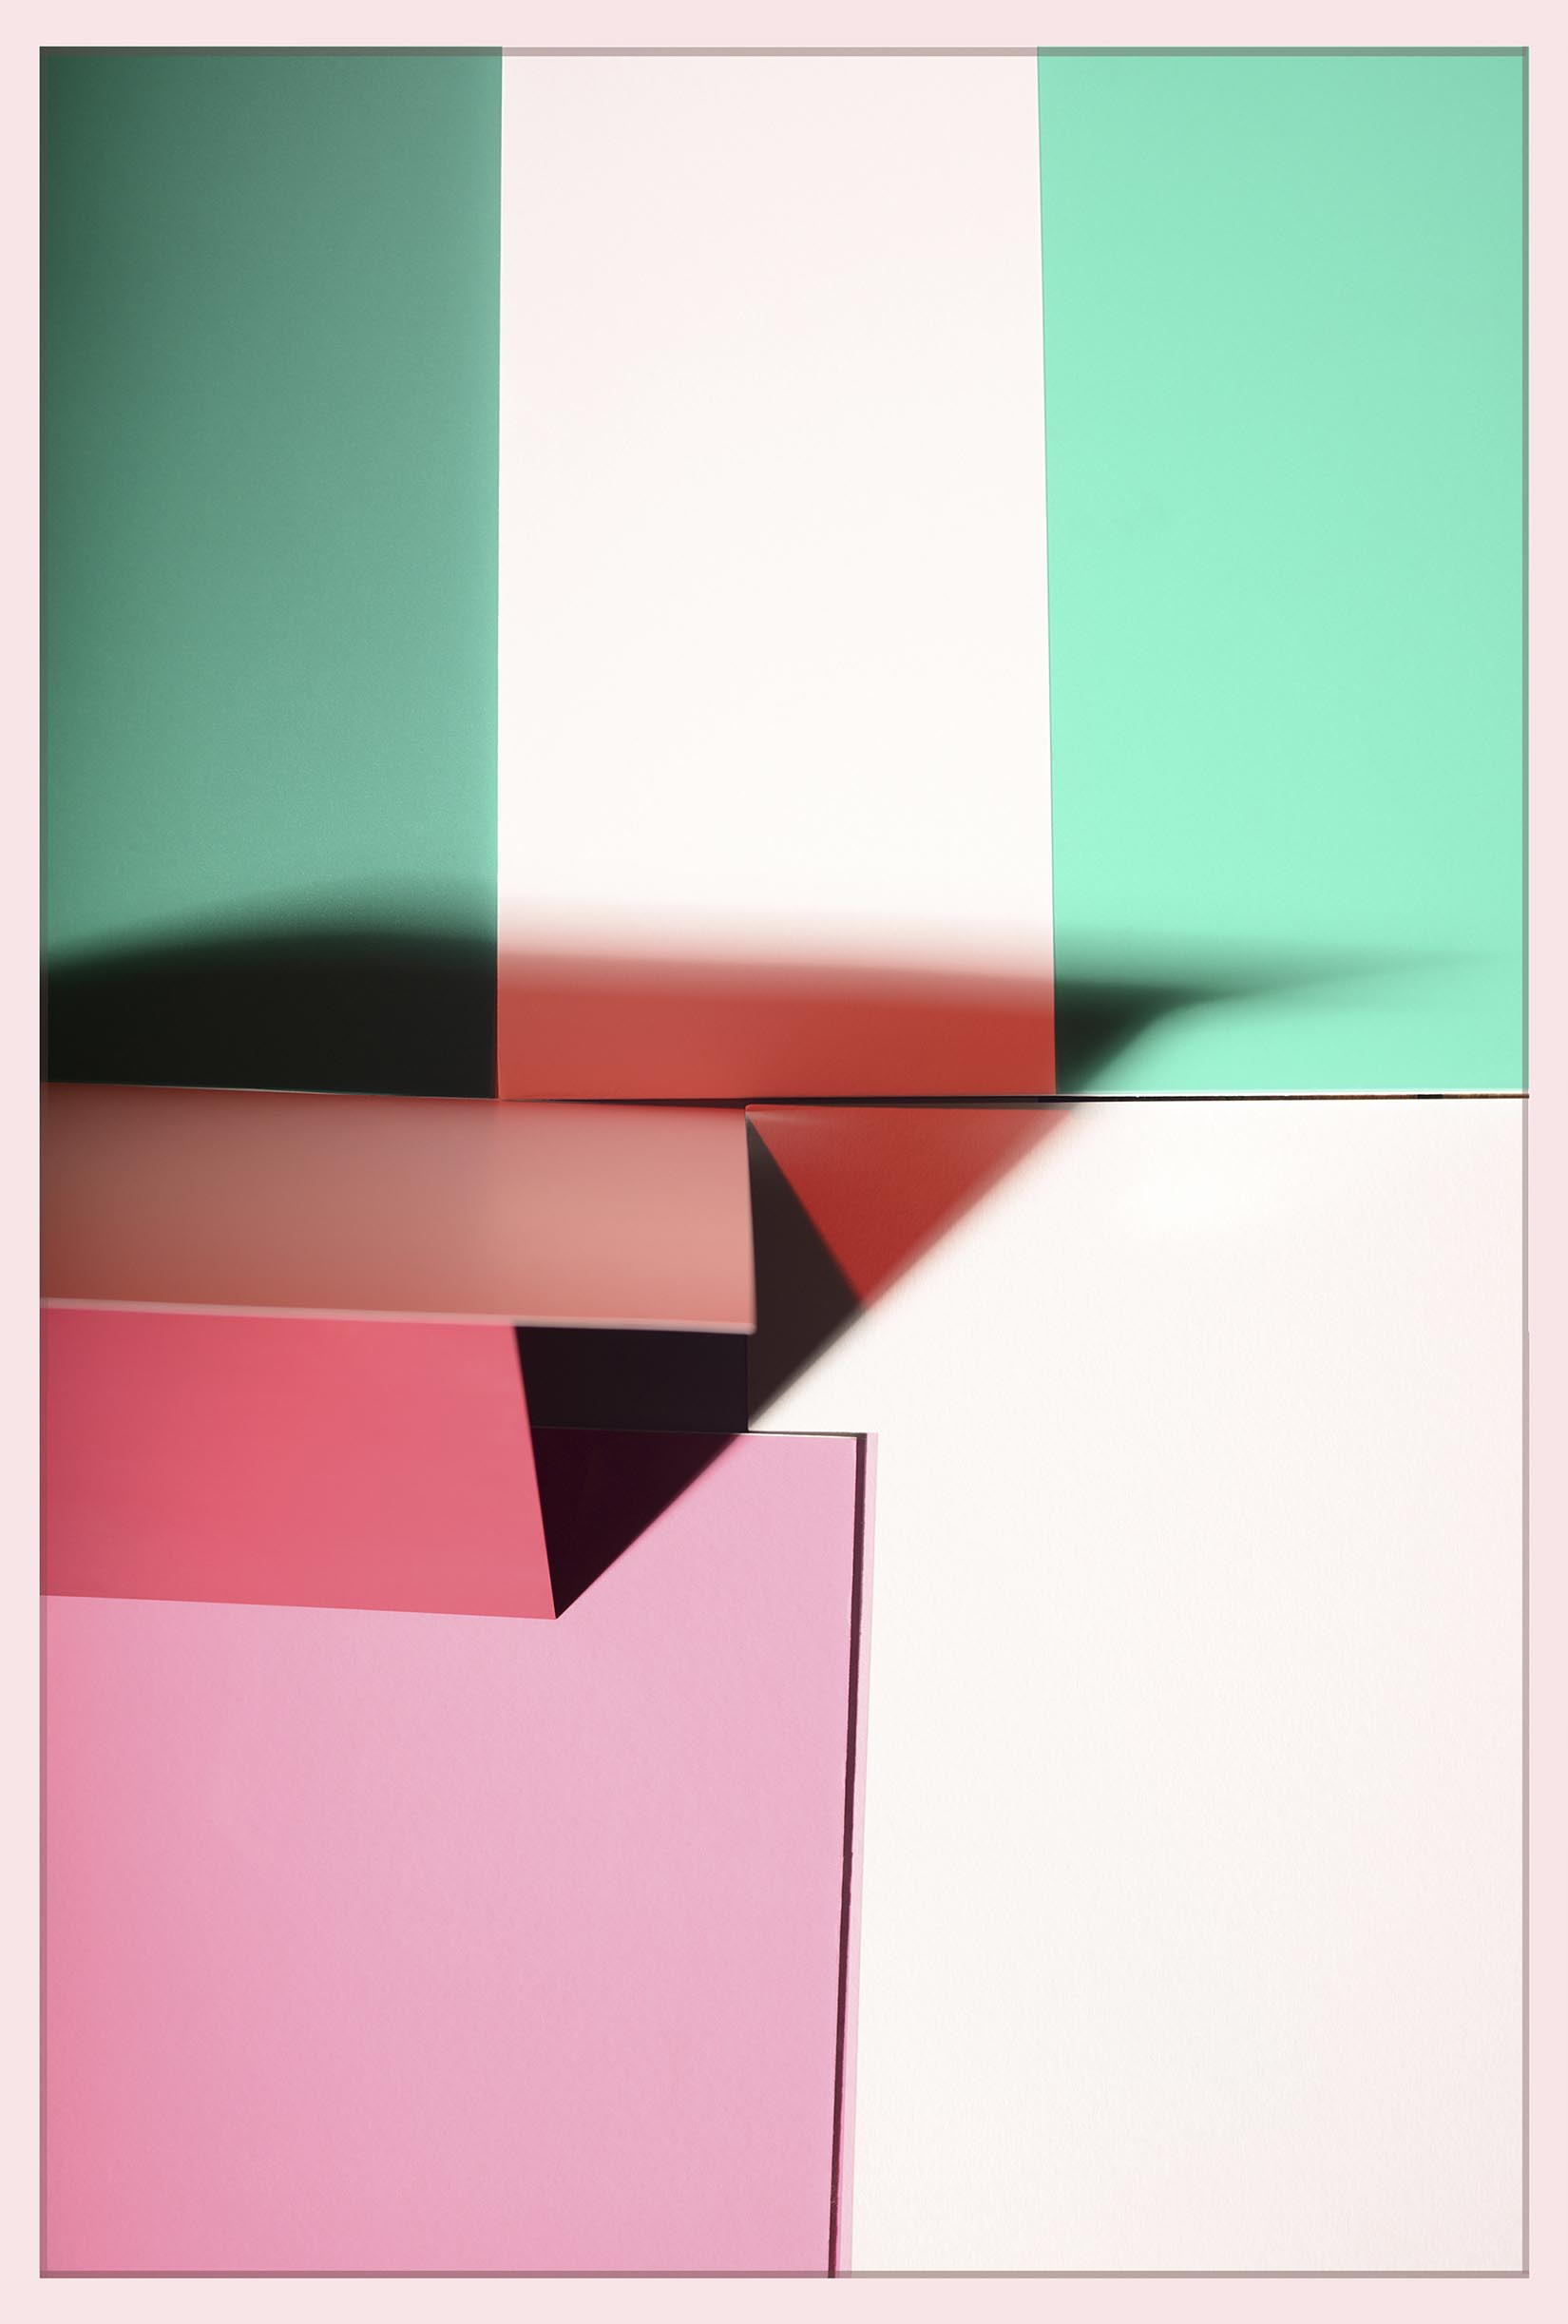 LYDIA WEGNER   Green Stripe  2017 Archival inkjet print 90 x 60 cm